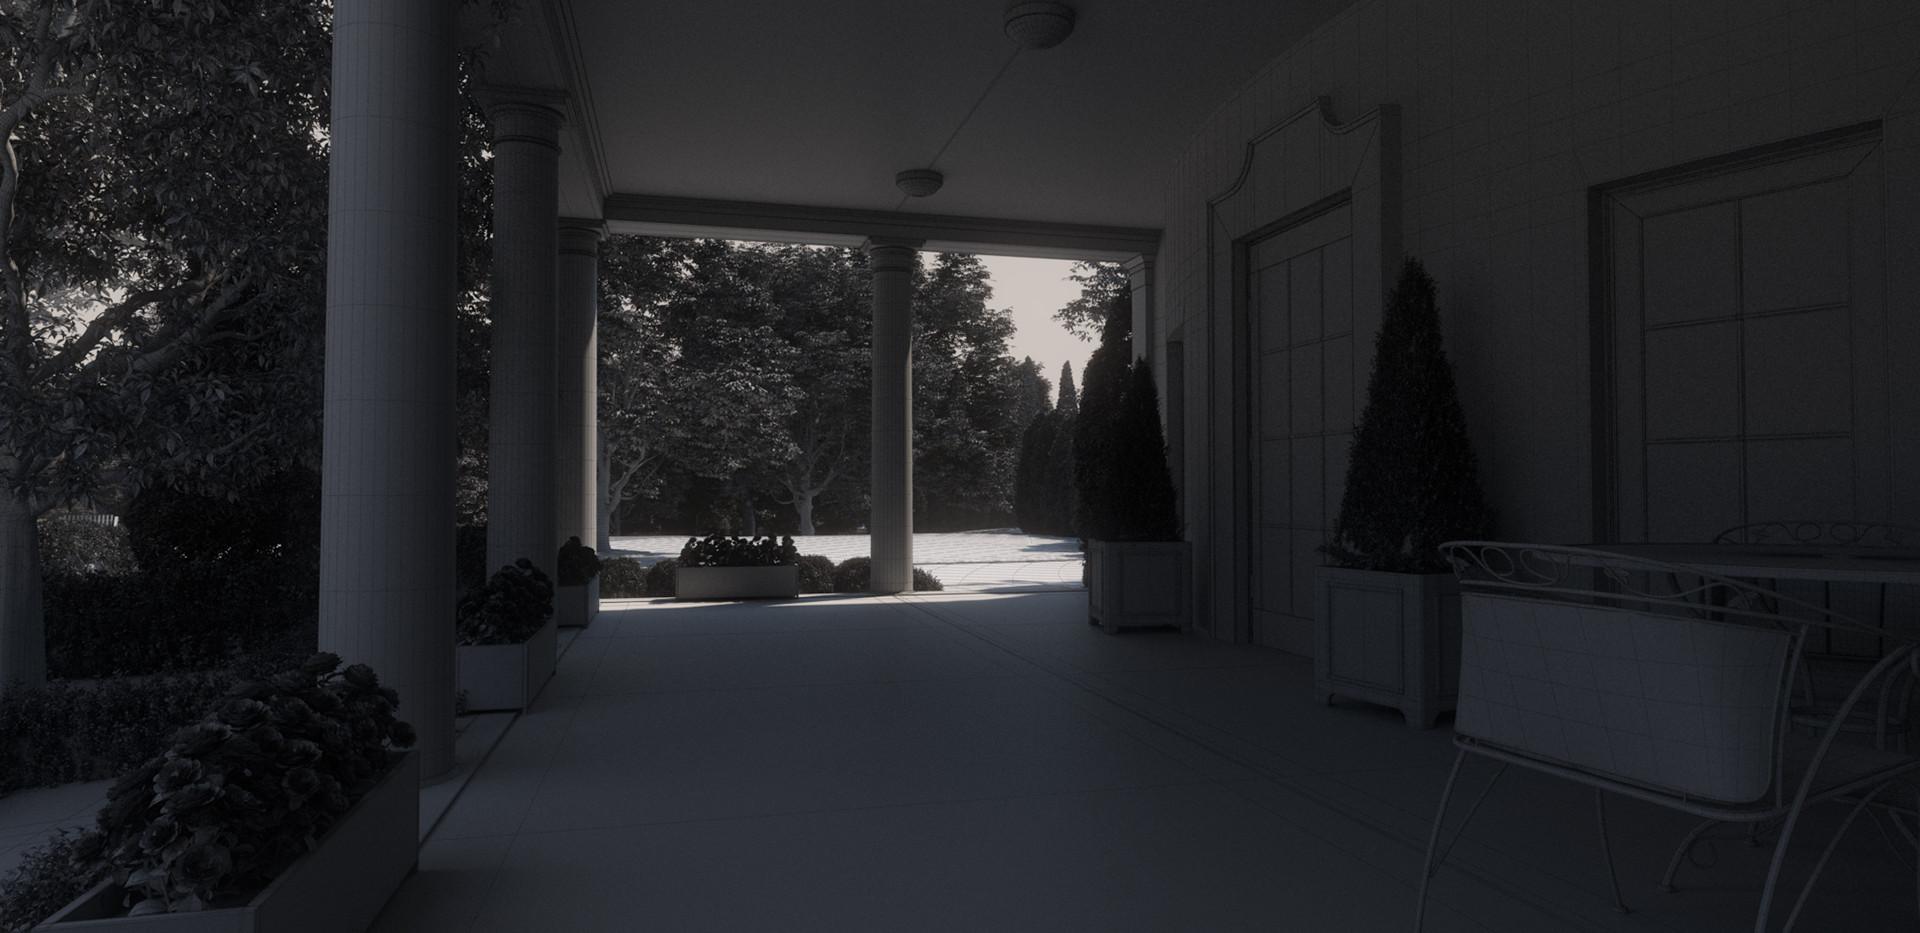 005wire_Camera015 copy.jpg